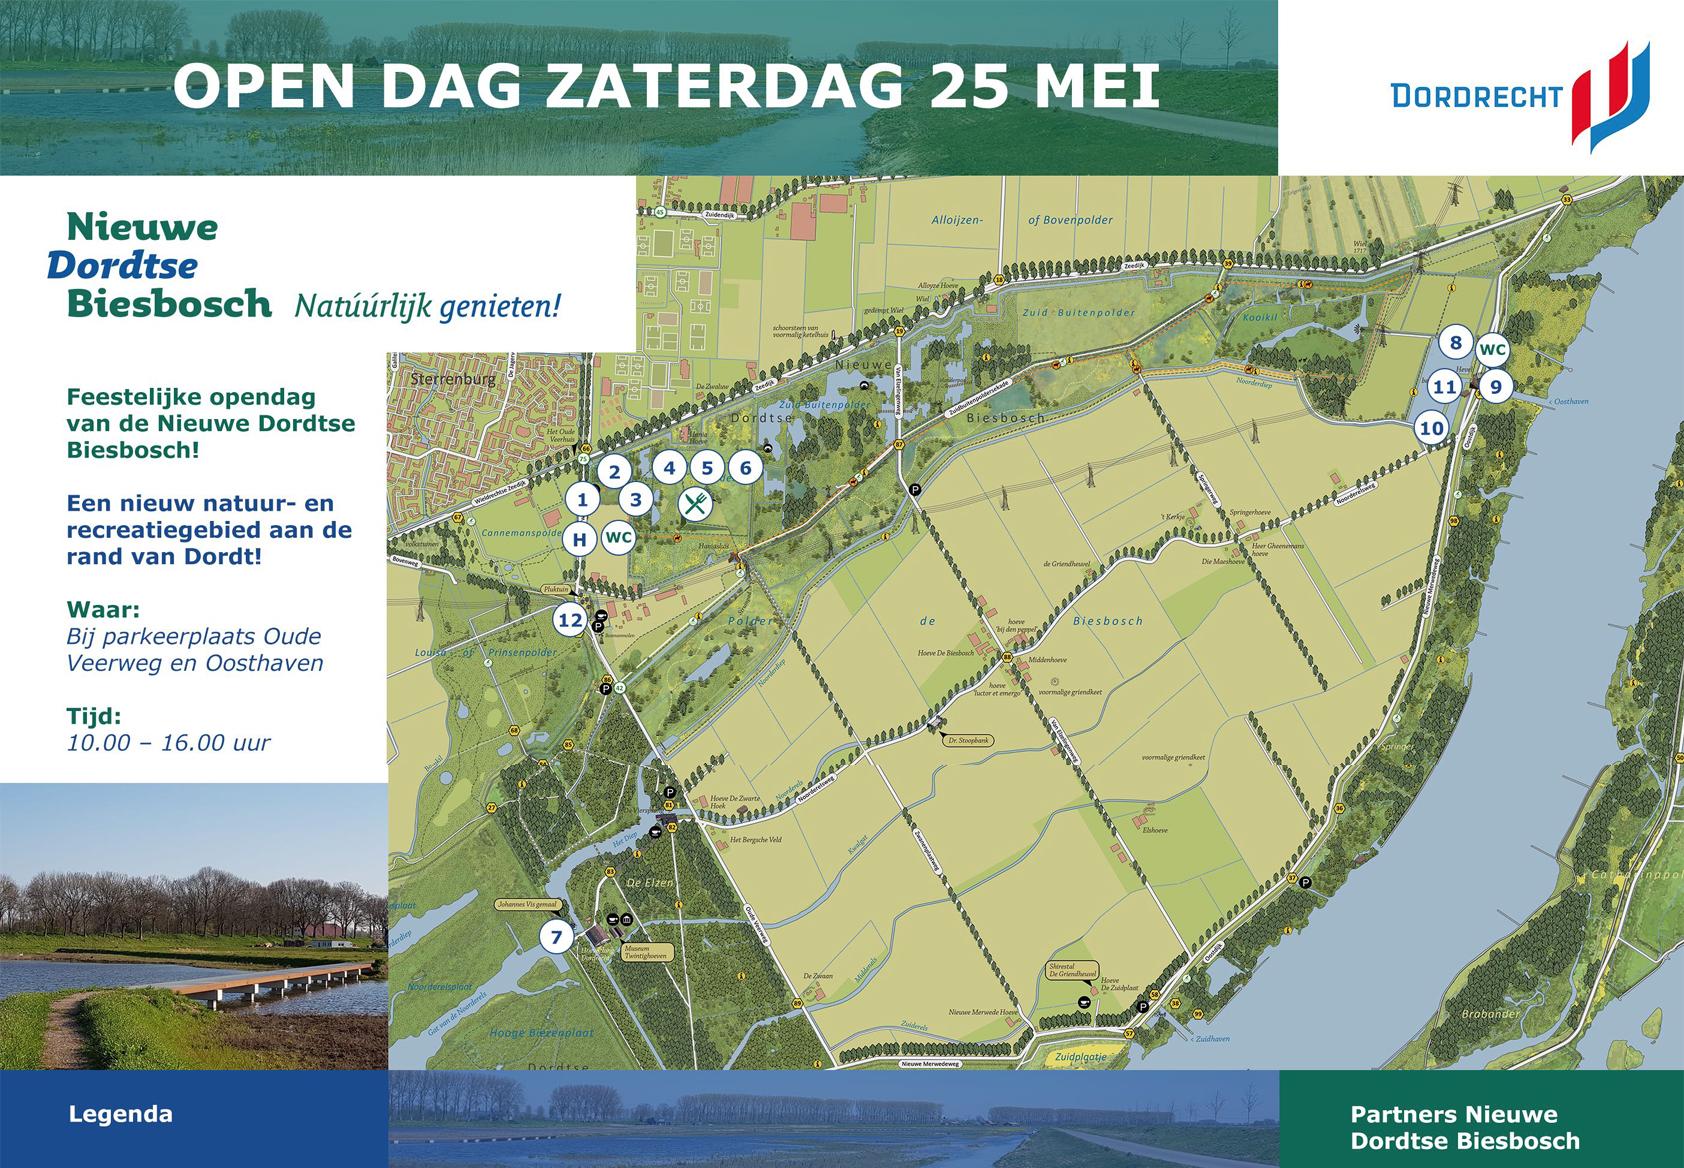 https://margowestgeest.nl/wp-content/uploads/2020/05/NieuweDordsteBierbosch-1.jpg